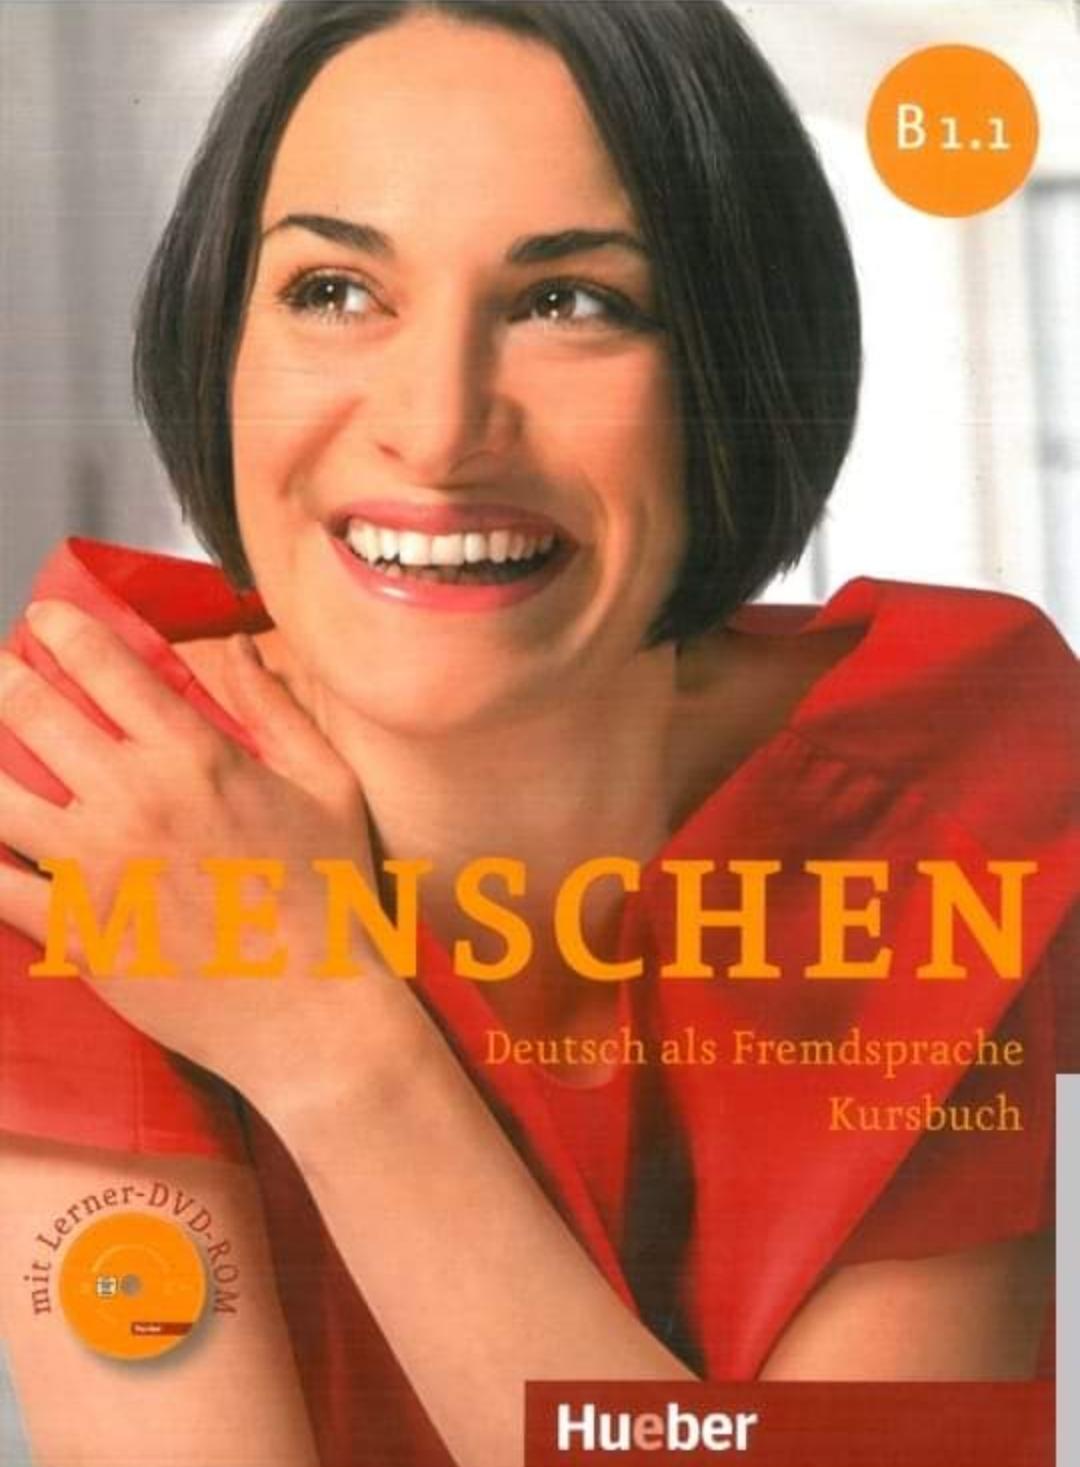 تحميل كتاب menschen a1 1 pdf